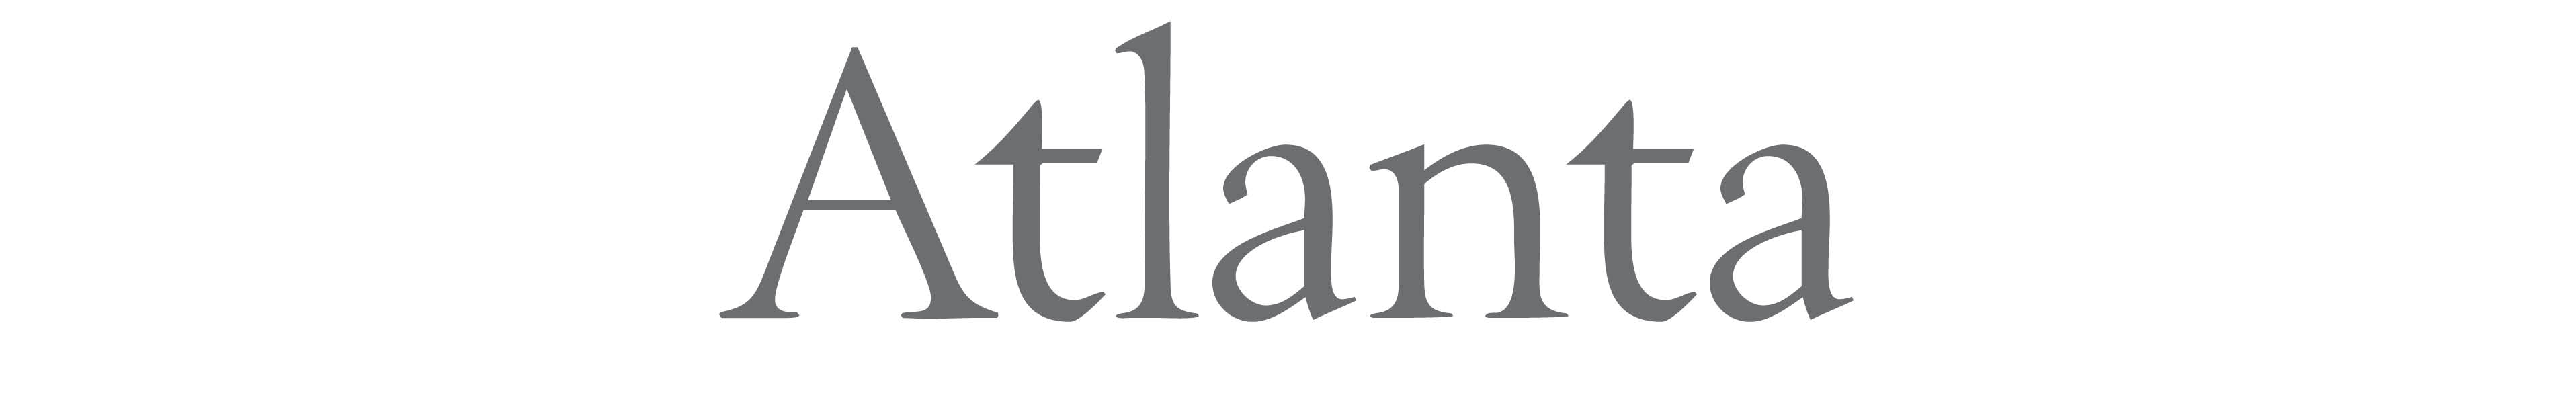 Atlanta Design Trade